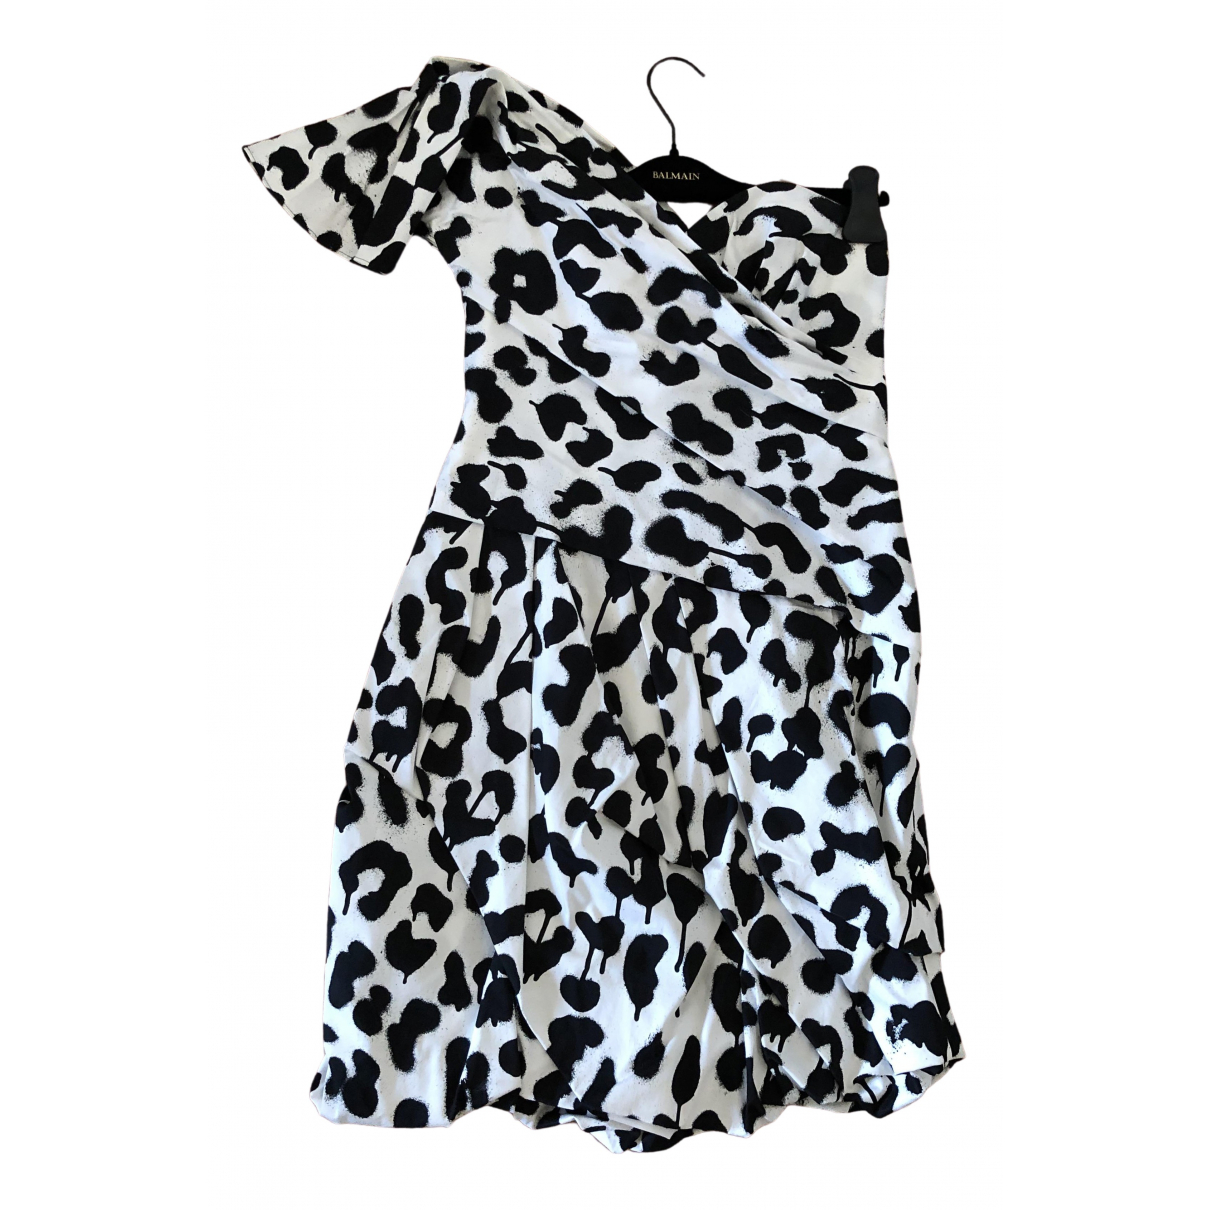 Moschino \N Cotton dress for Women 42 IT